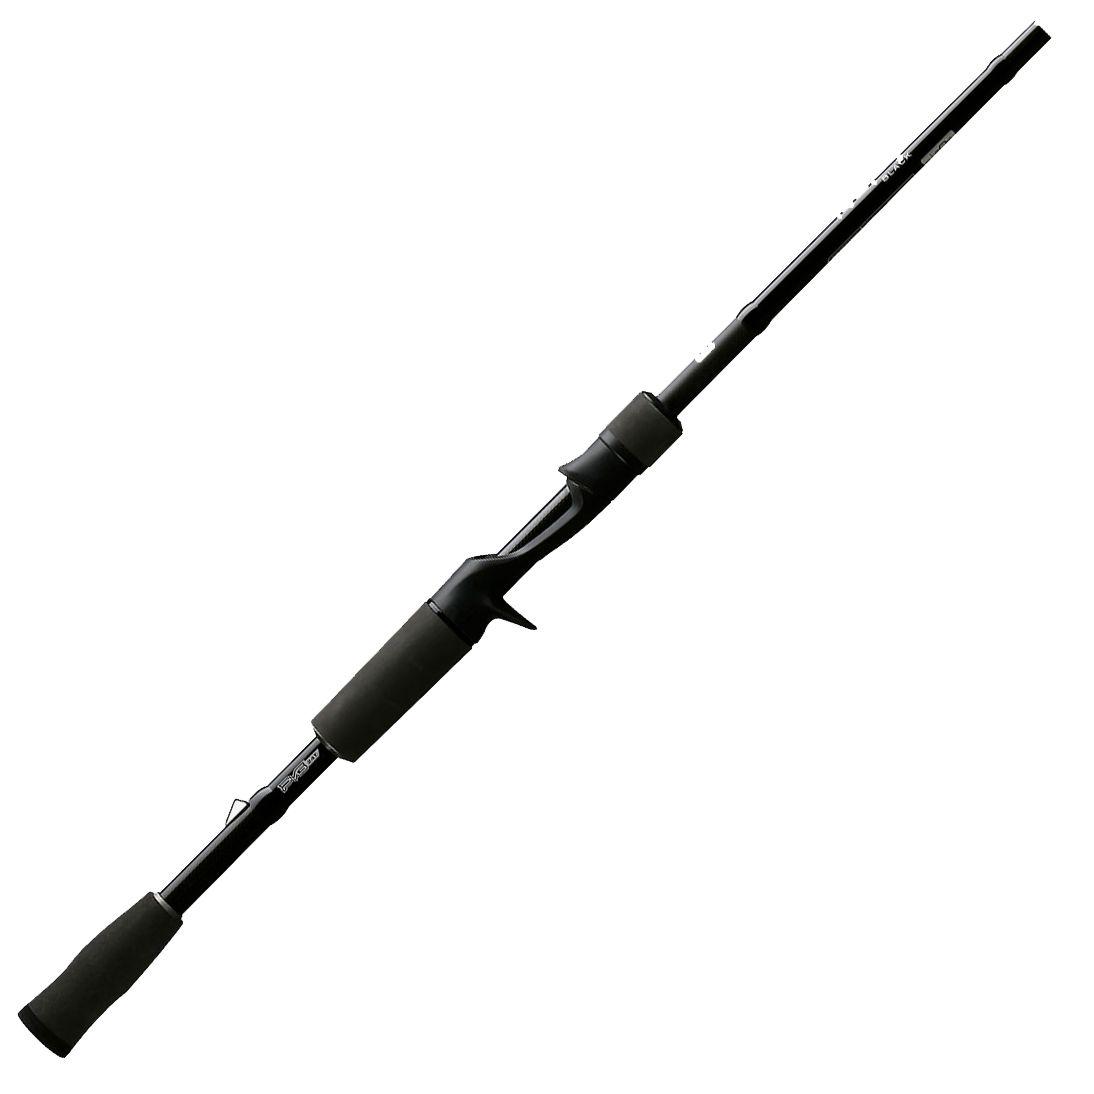 13 Fishing Defy Black Gen II Casting Rod thumbnail